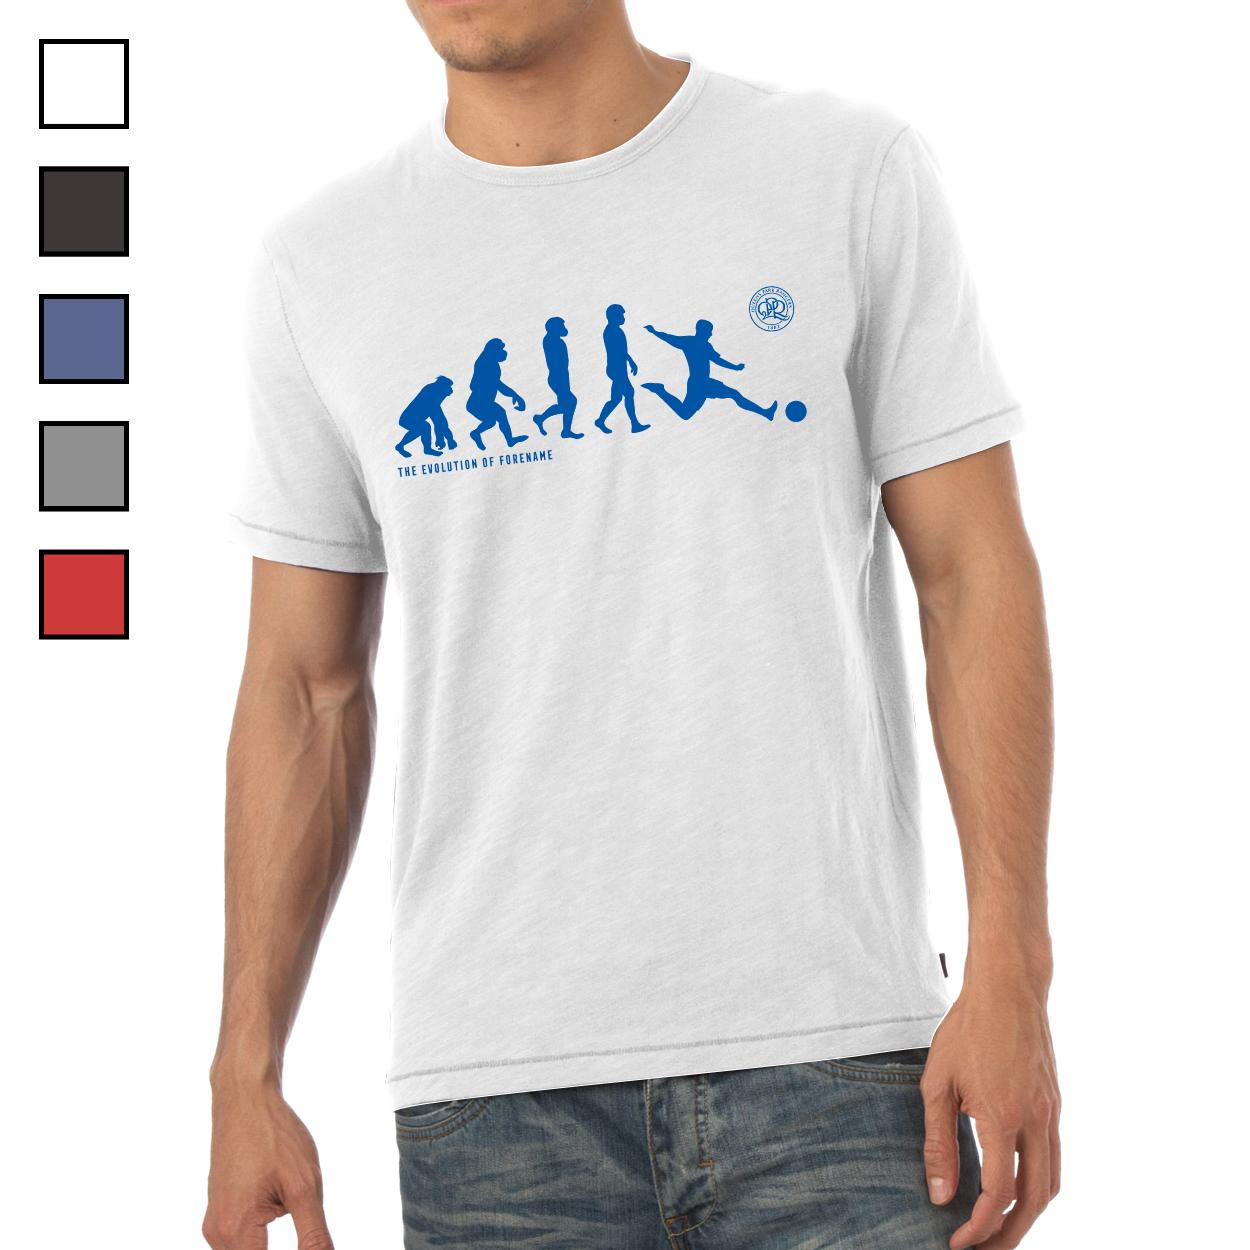 Queens Park Rangers FC Evolution Mens T-Shirt